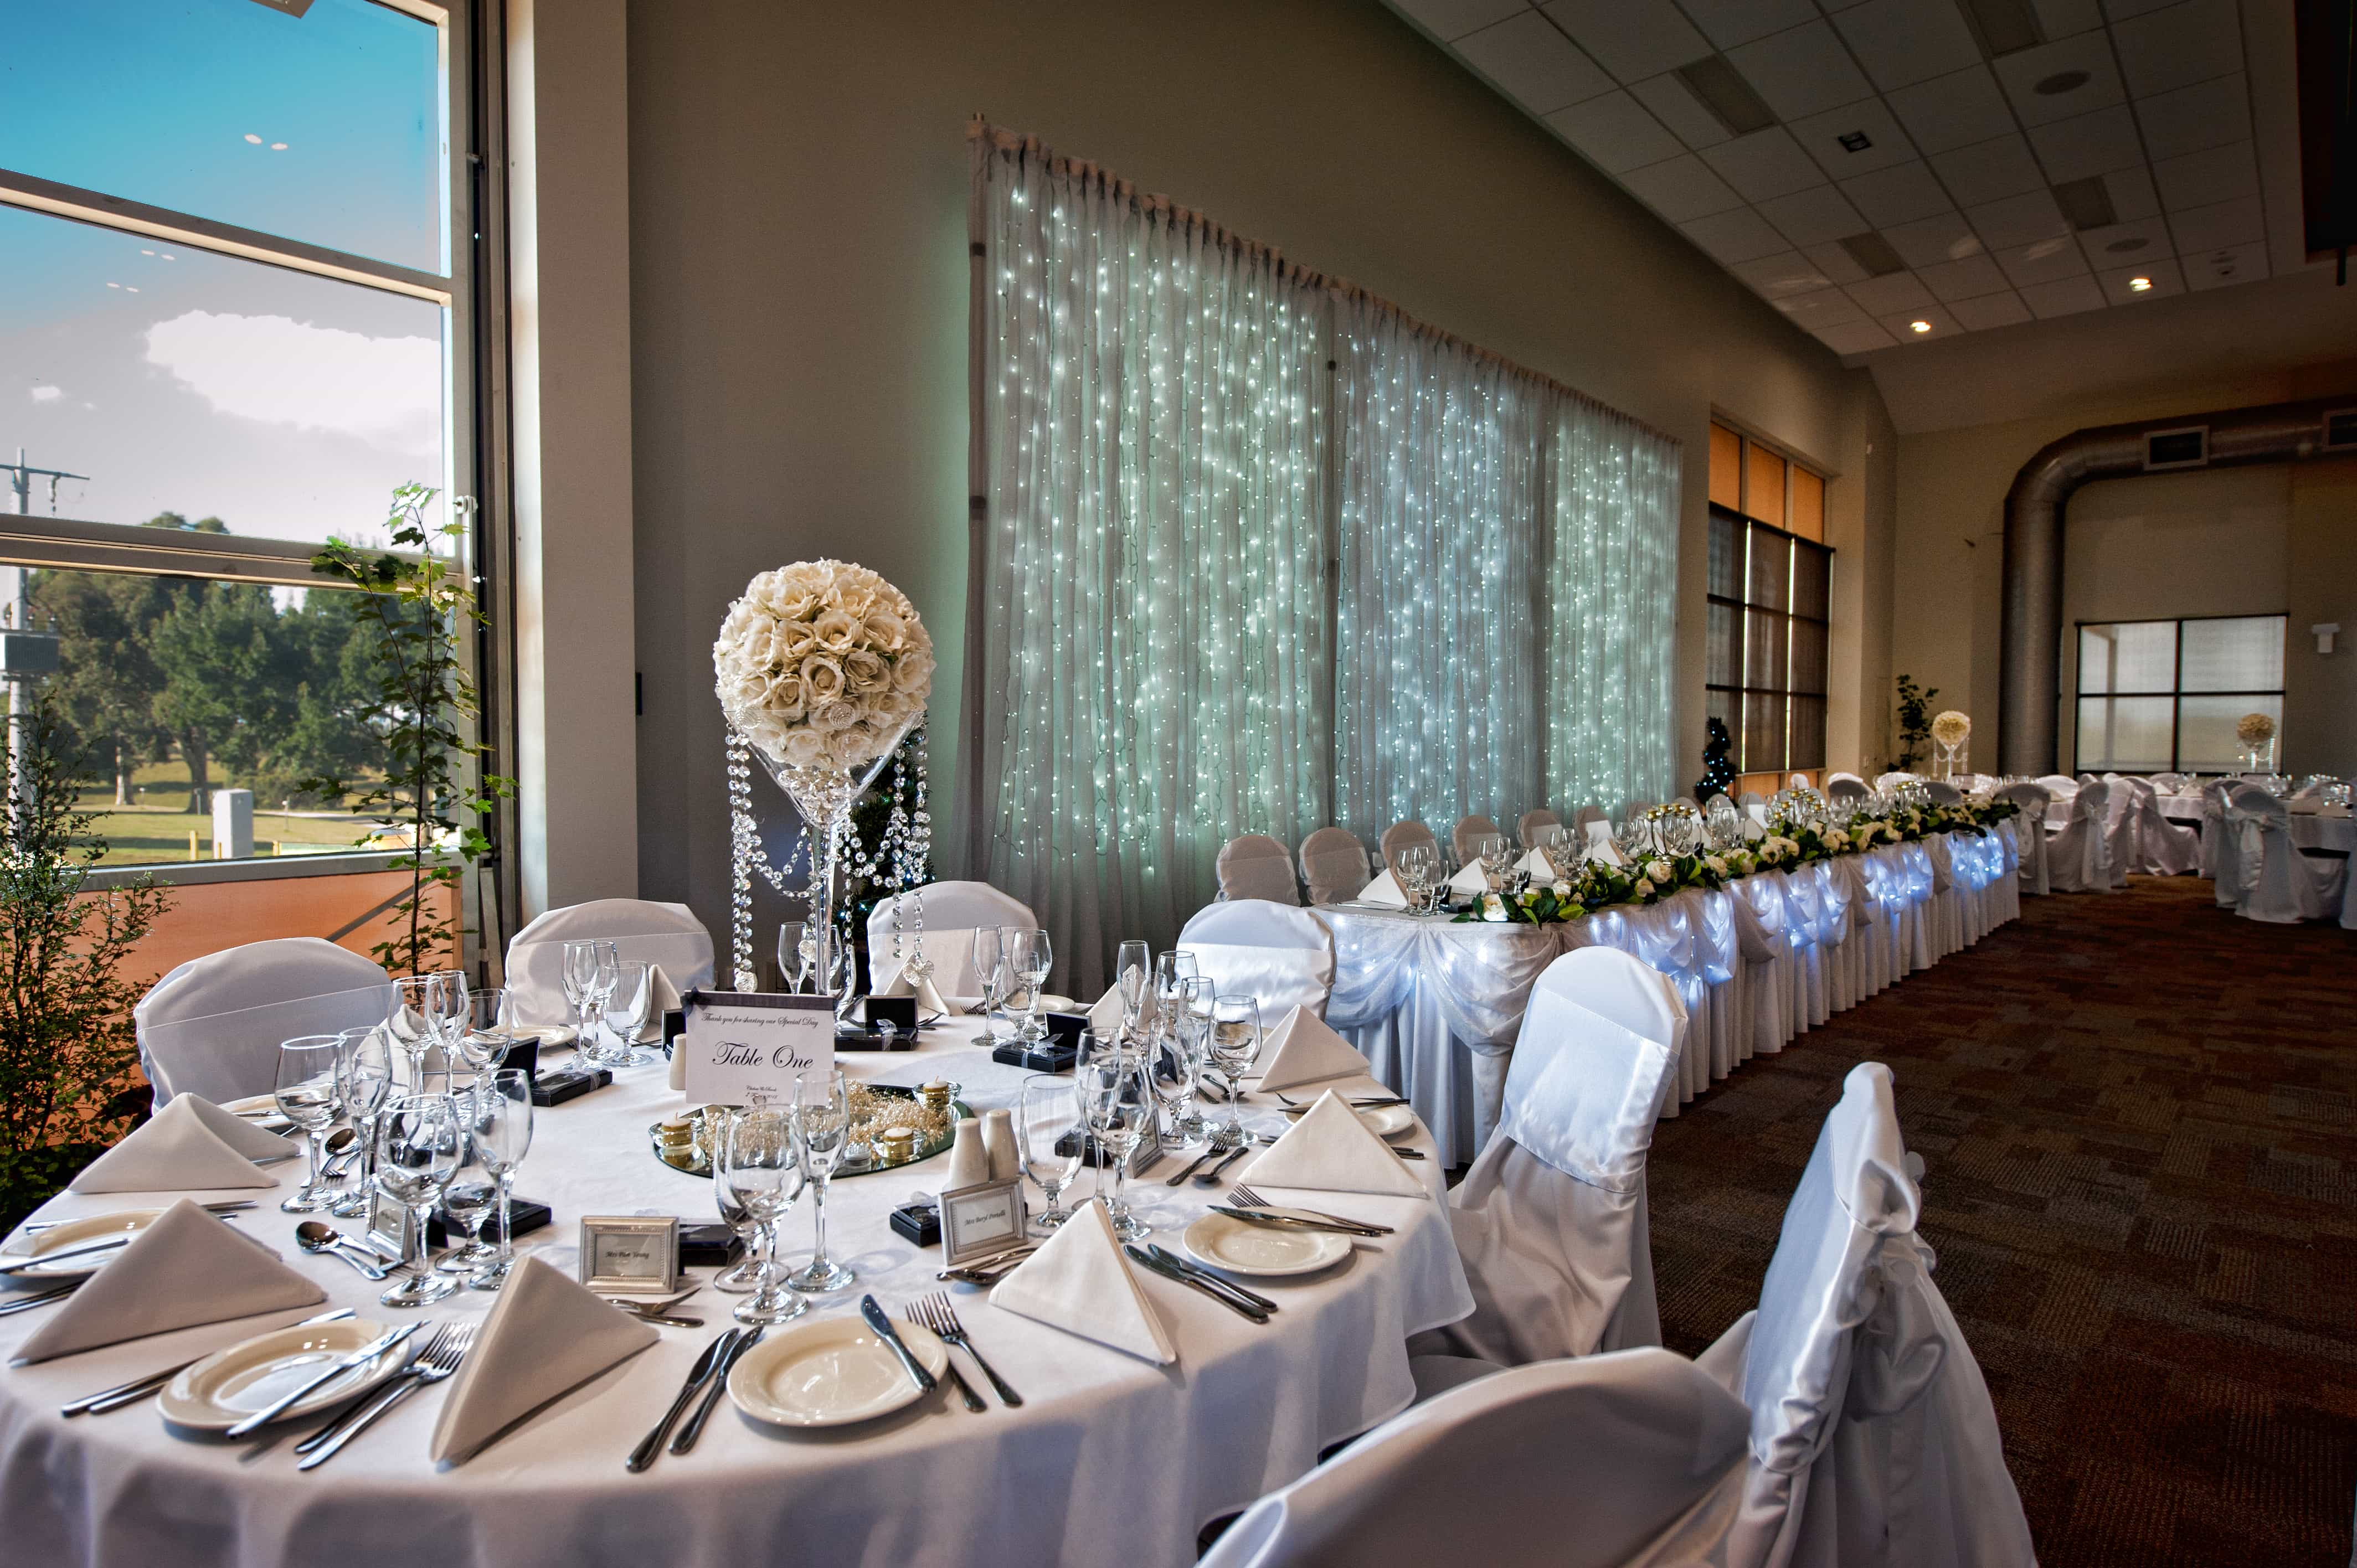 Lardner Park Wedding Venue Decorations